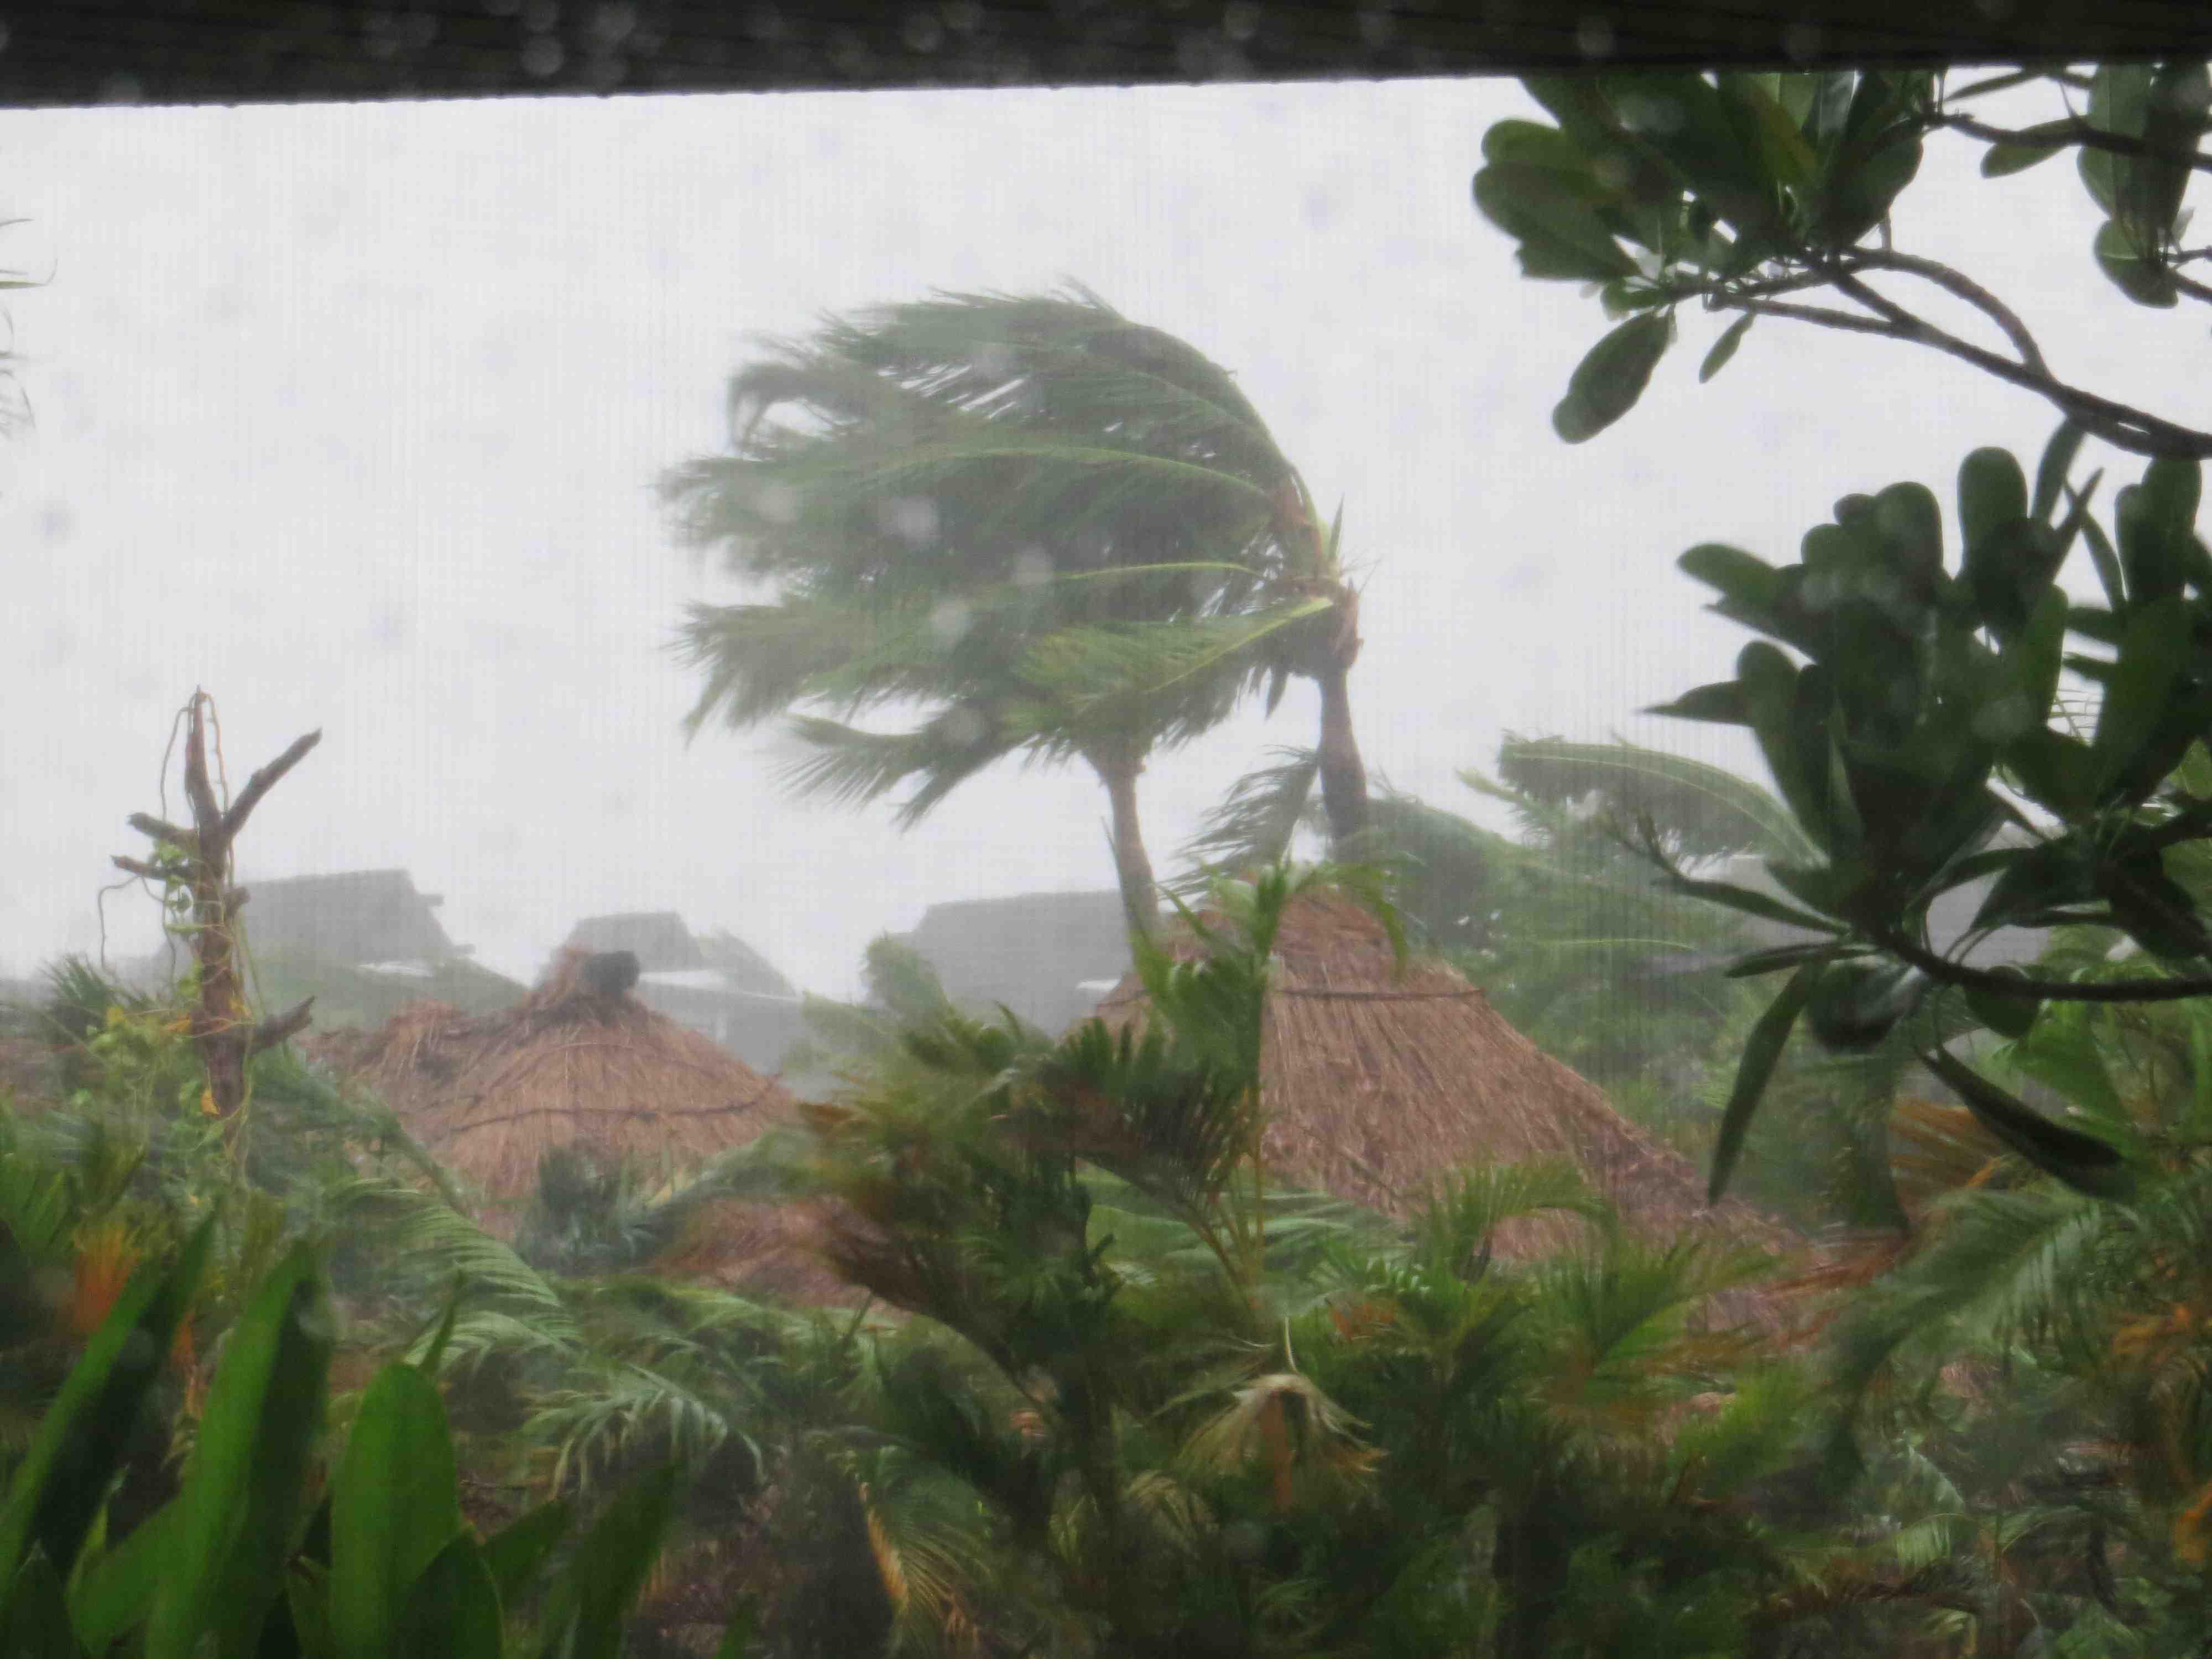 Serious Winds And Rain From Tropical Storm Evan Hitting Fiji Monday 17 Dec 2012